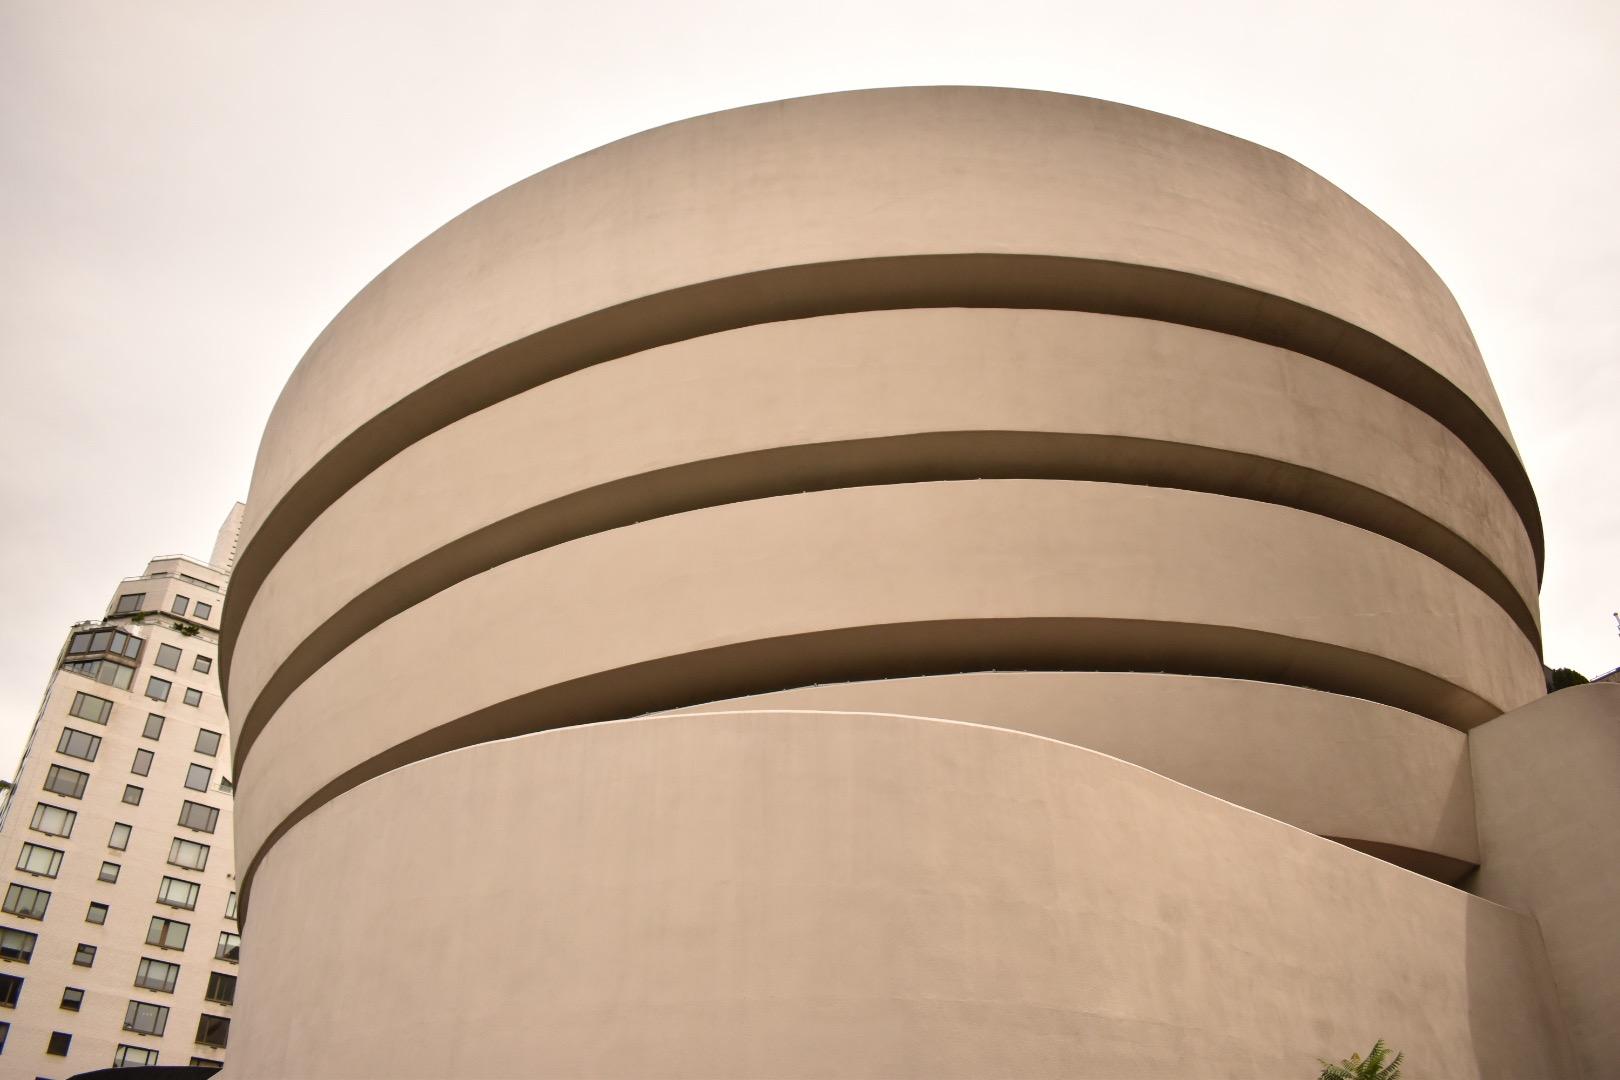 Guggenheim in New York